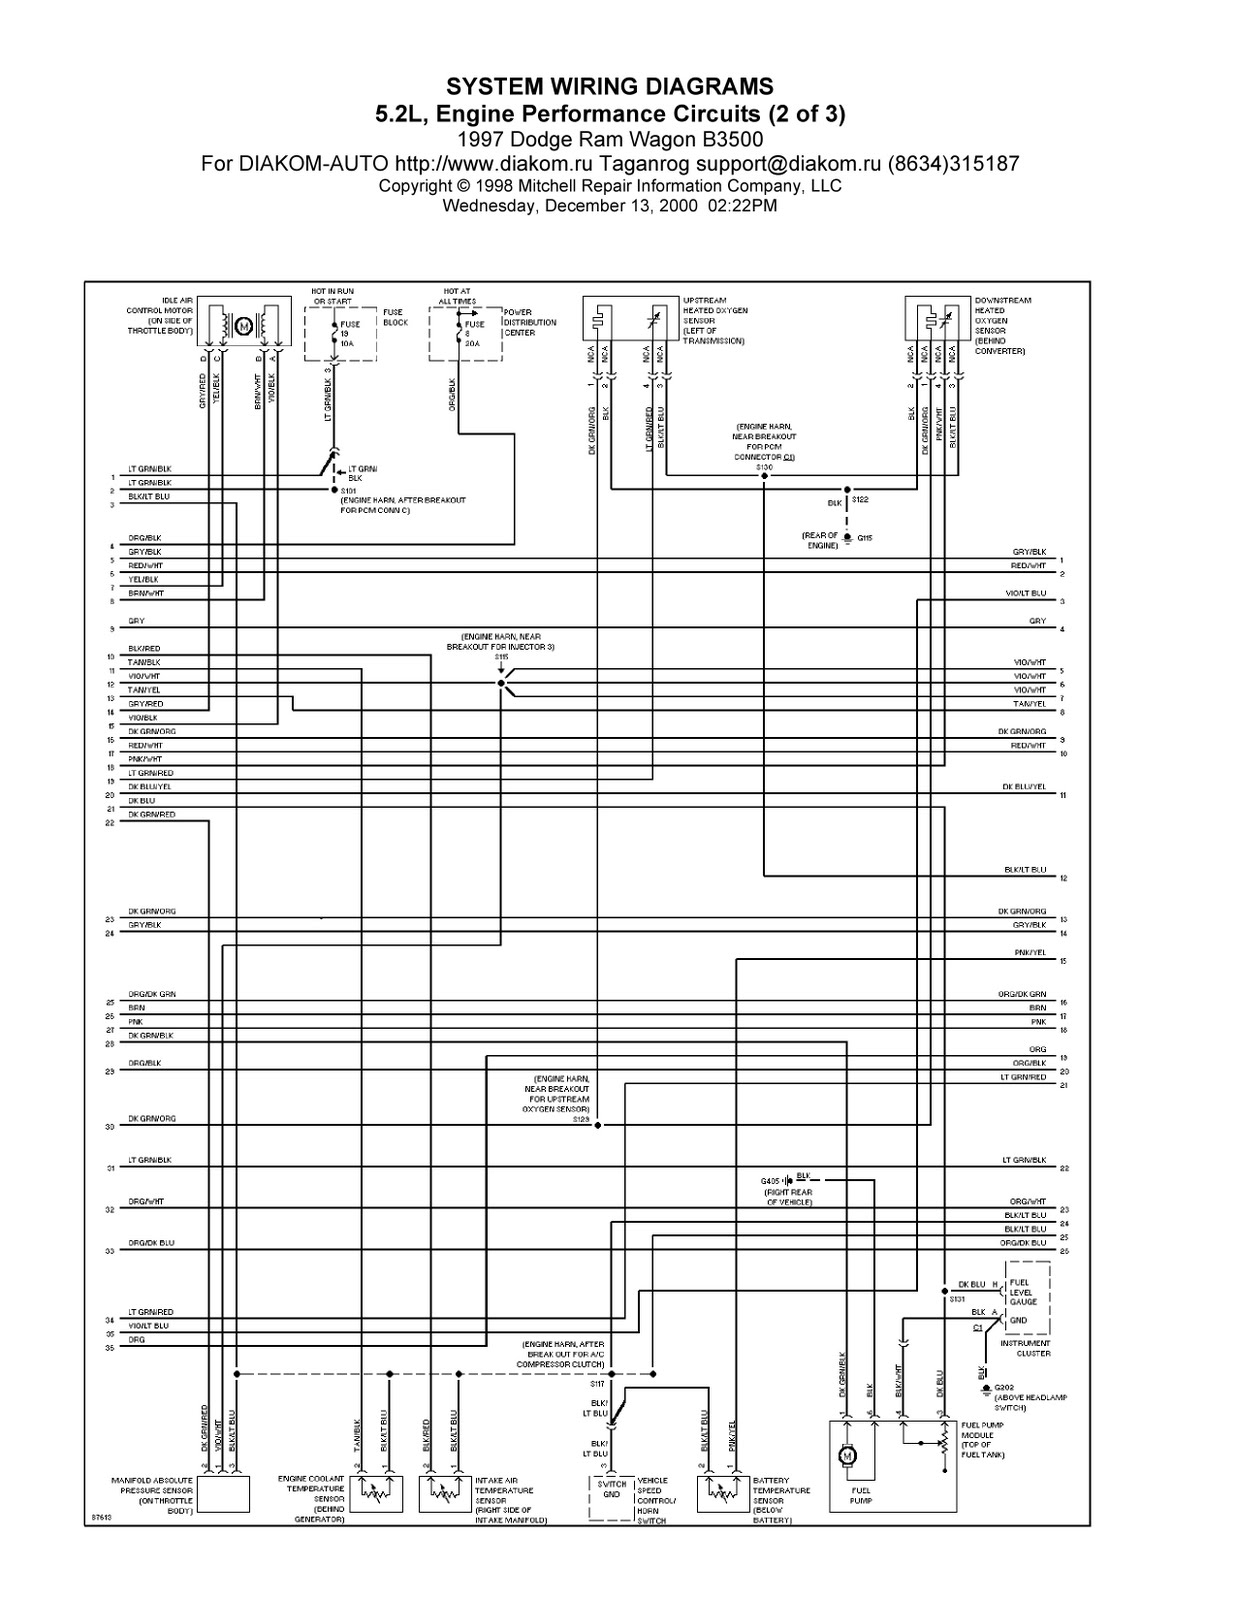 1997 Dodge Ram Wagon B3500 System Wiring Diagram 5,2L